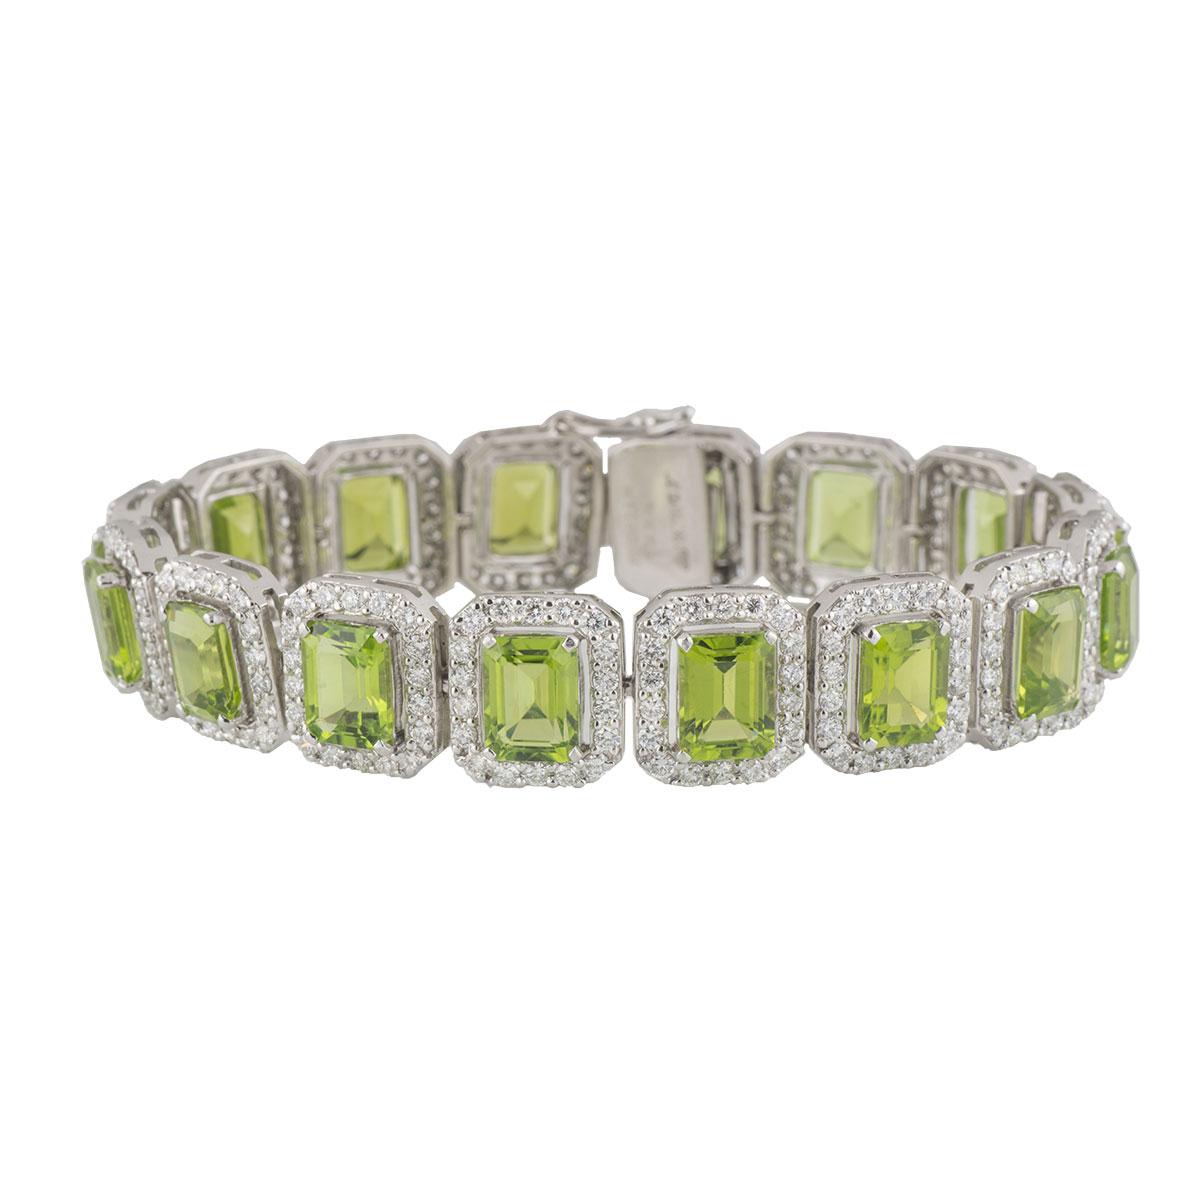 White Gold Diamond and Peridot Line Bracelet